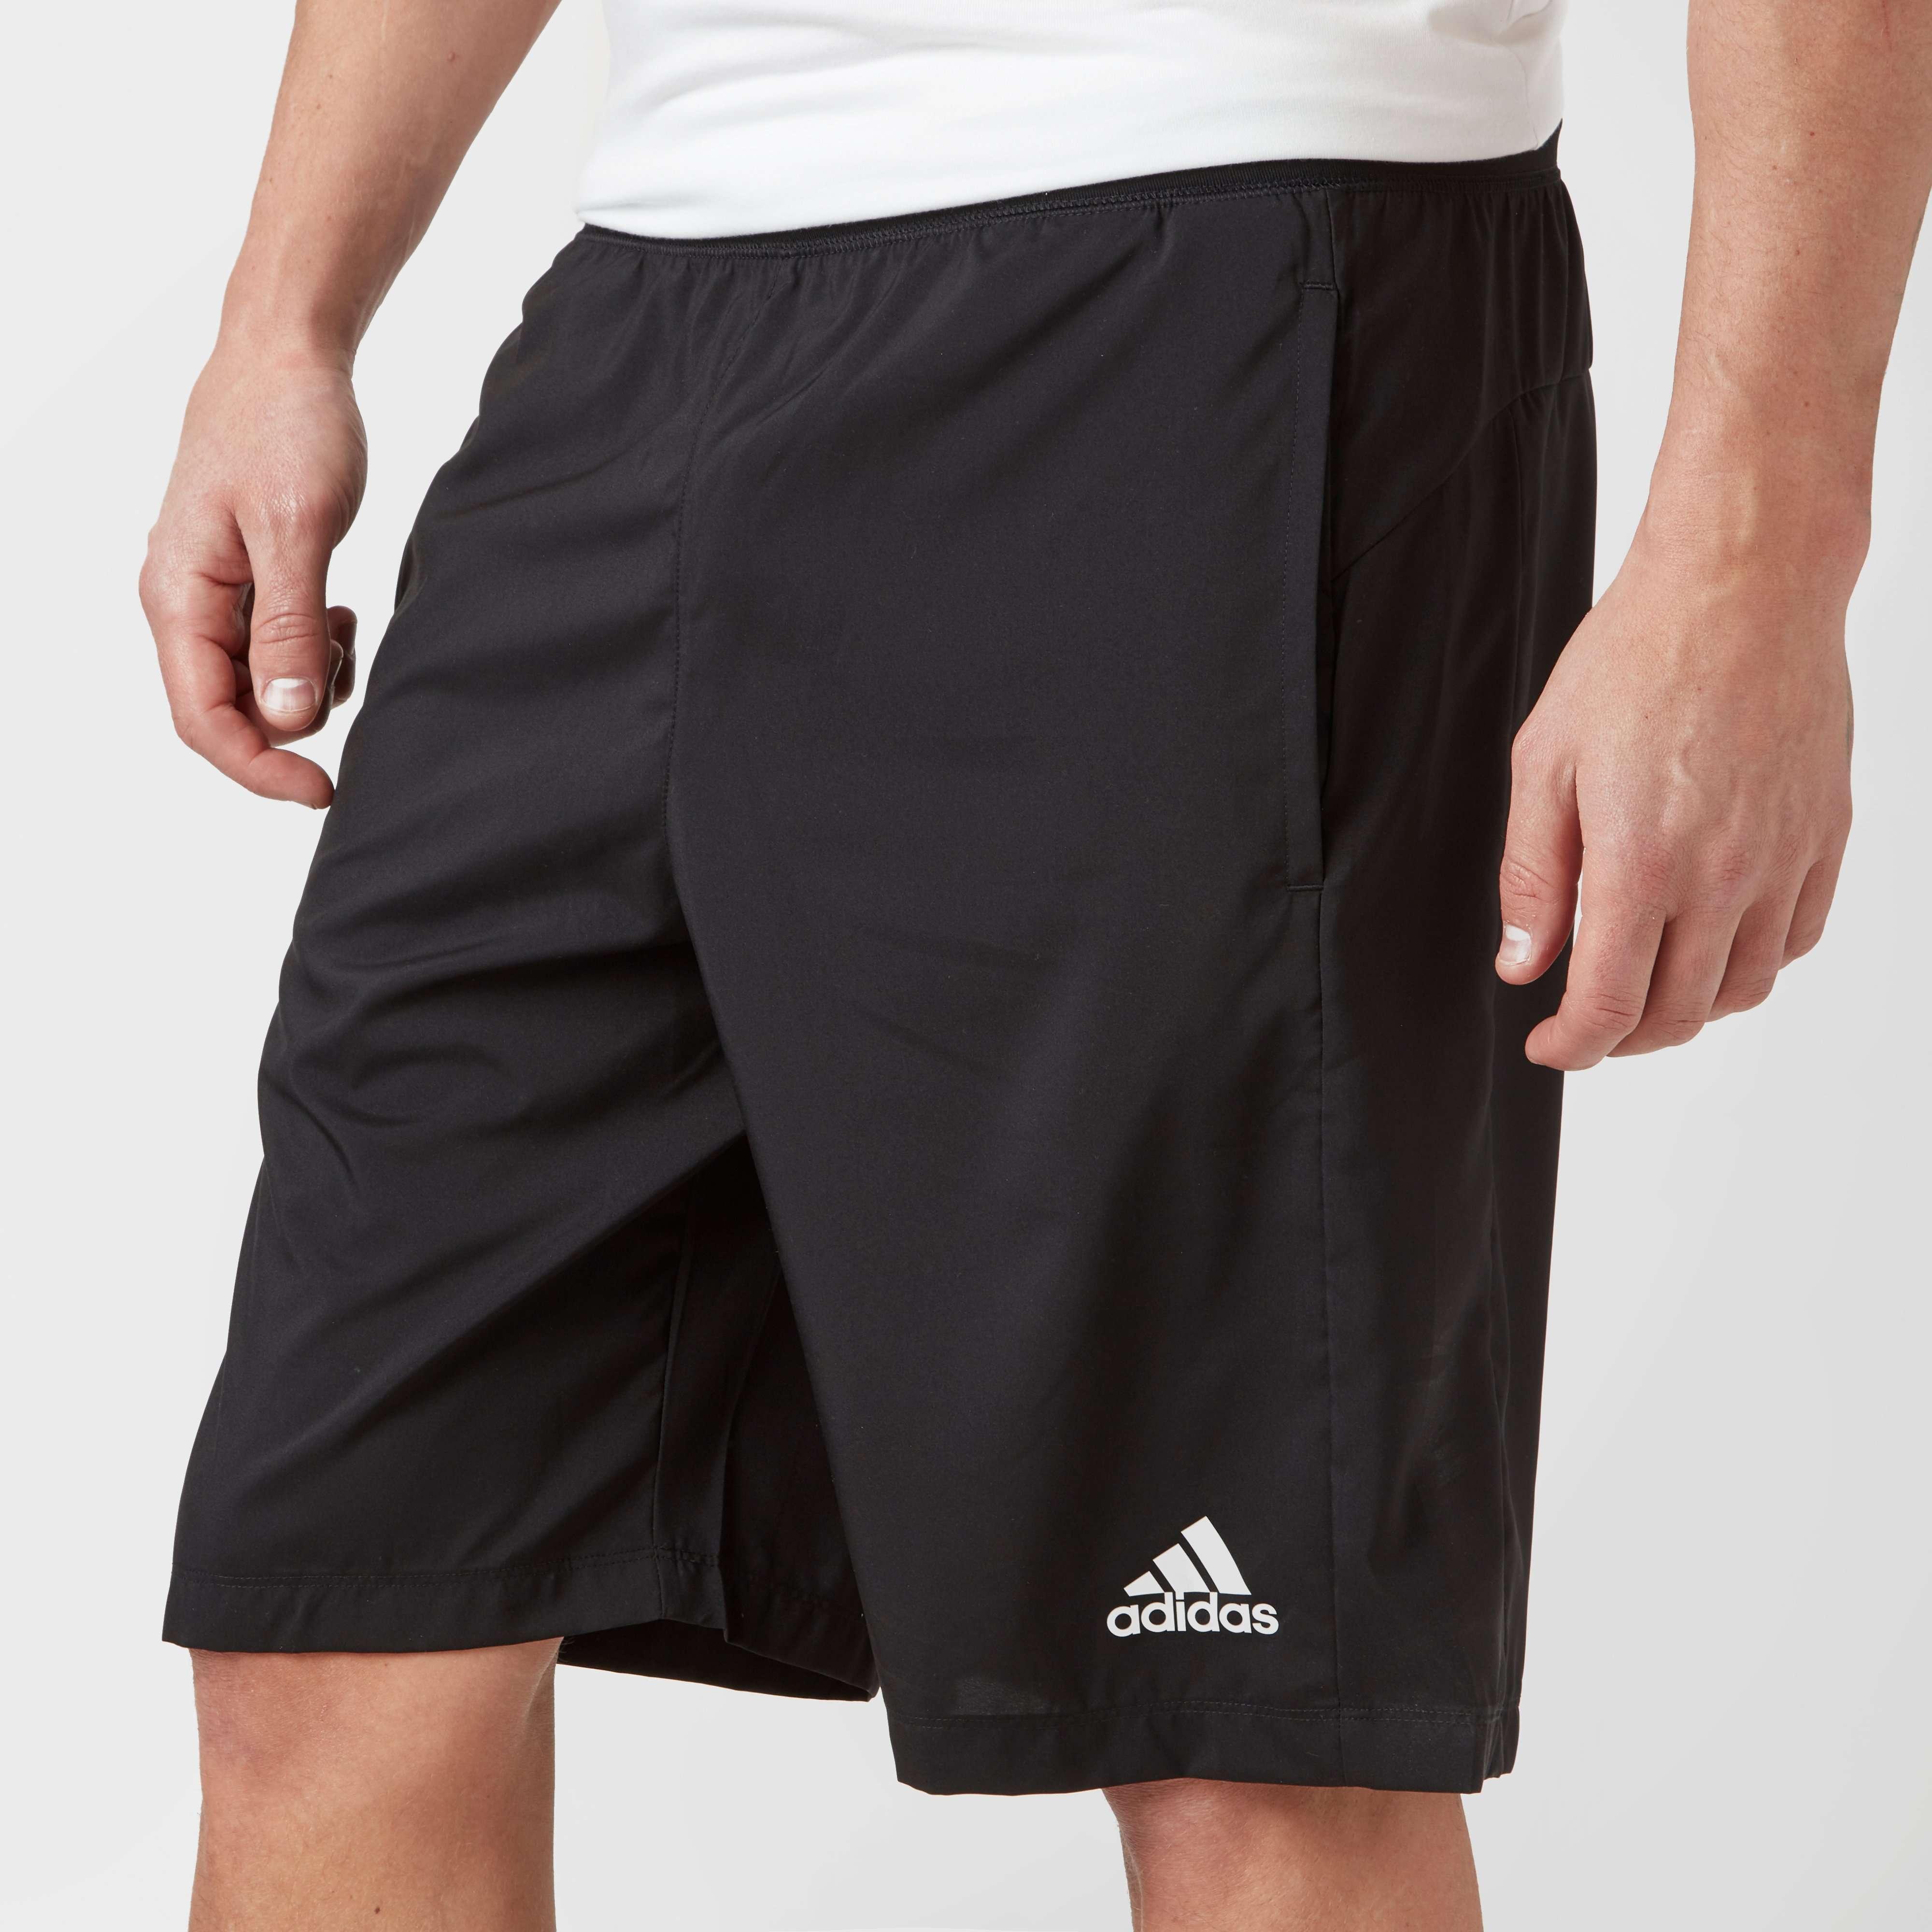 ADIDAS Men's D2M Shorts